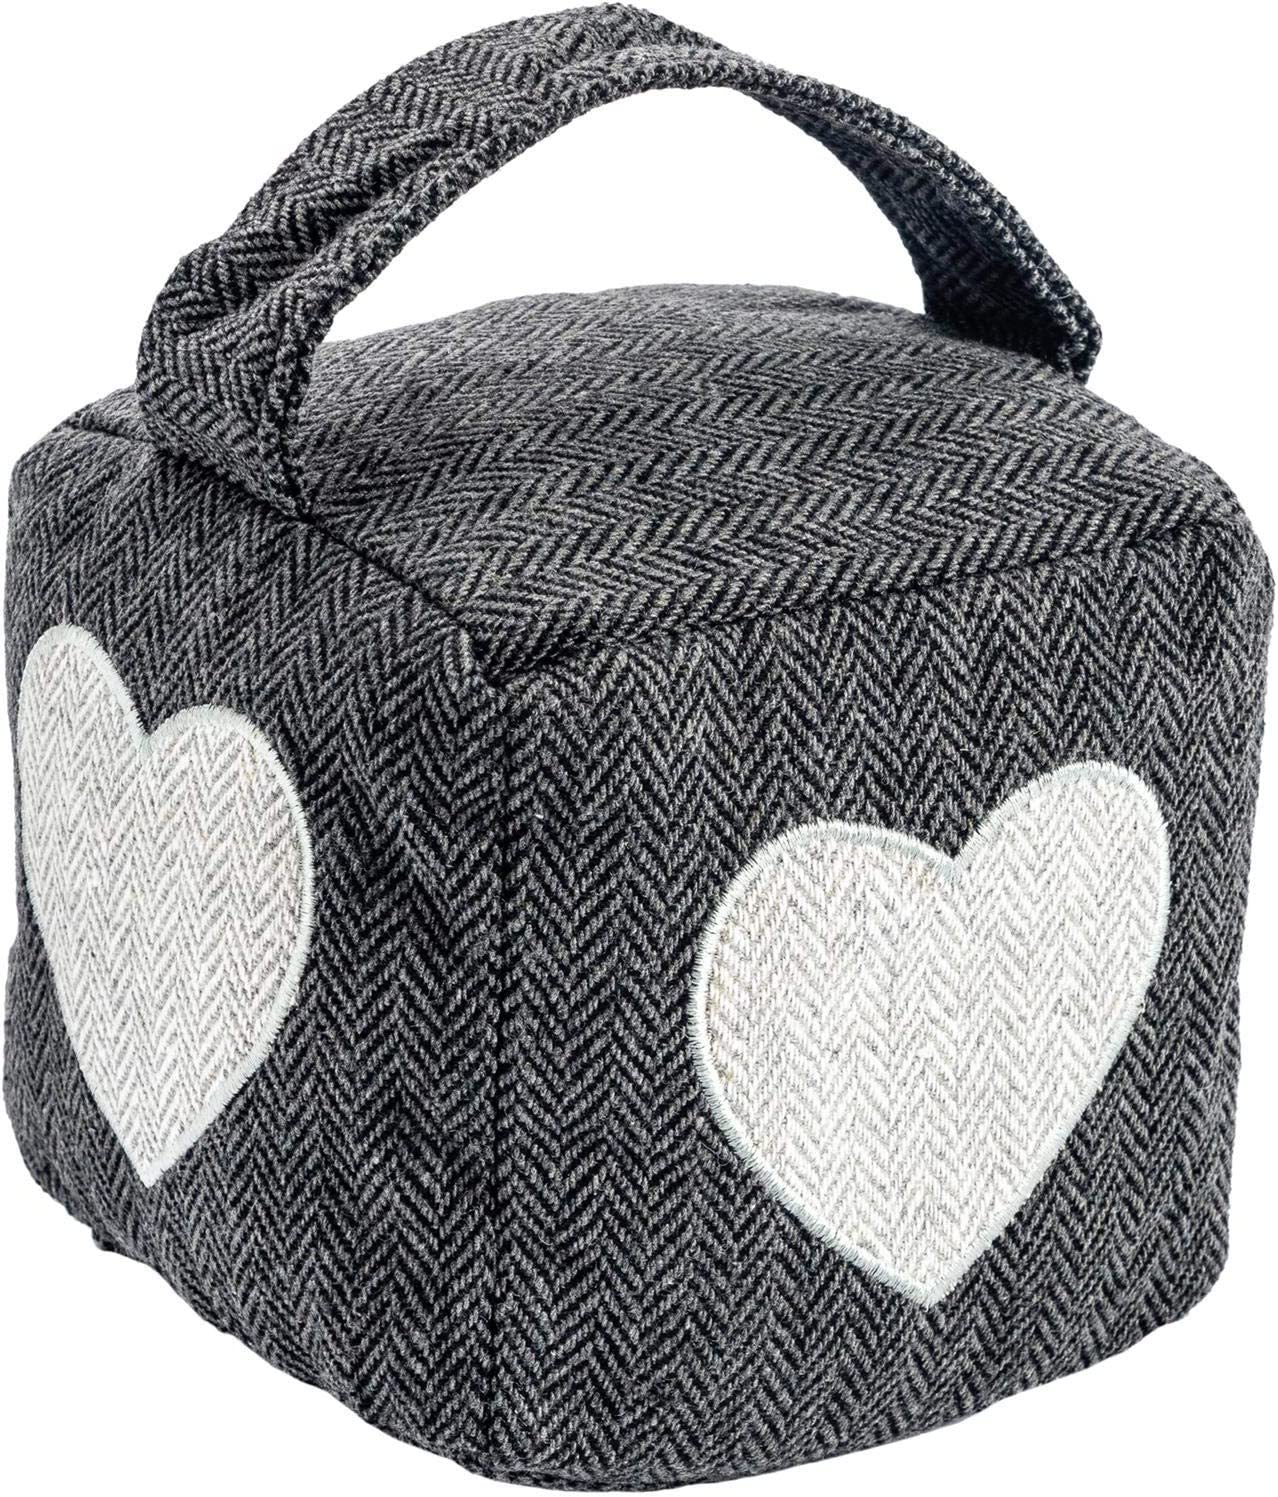 Nicola Spring Home All items in the store Interior Doorstop - Heart Pa Popularity Herringbone Grey